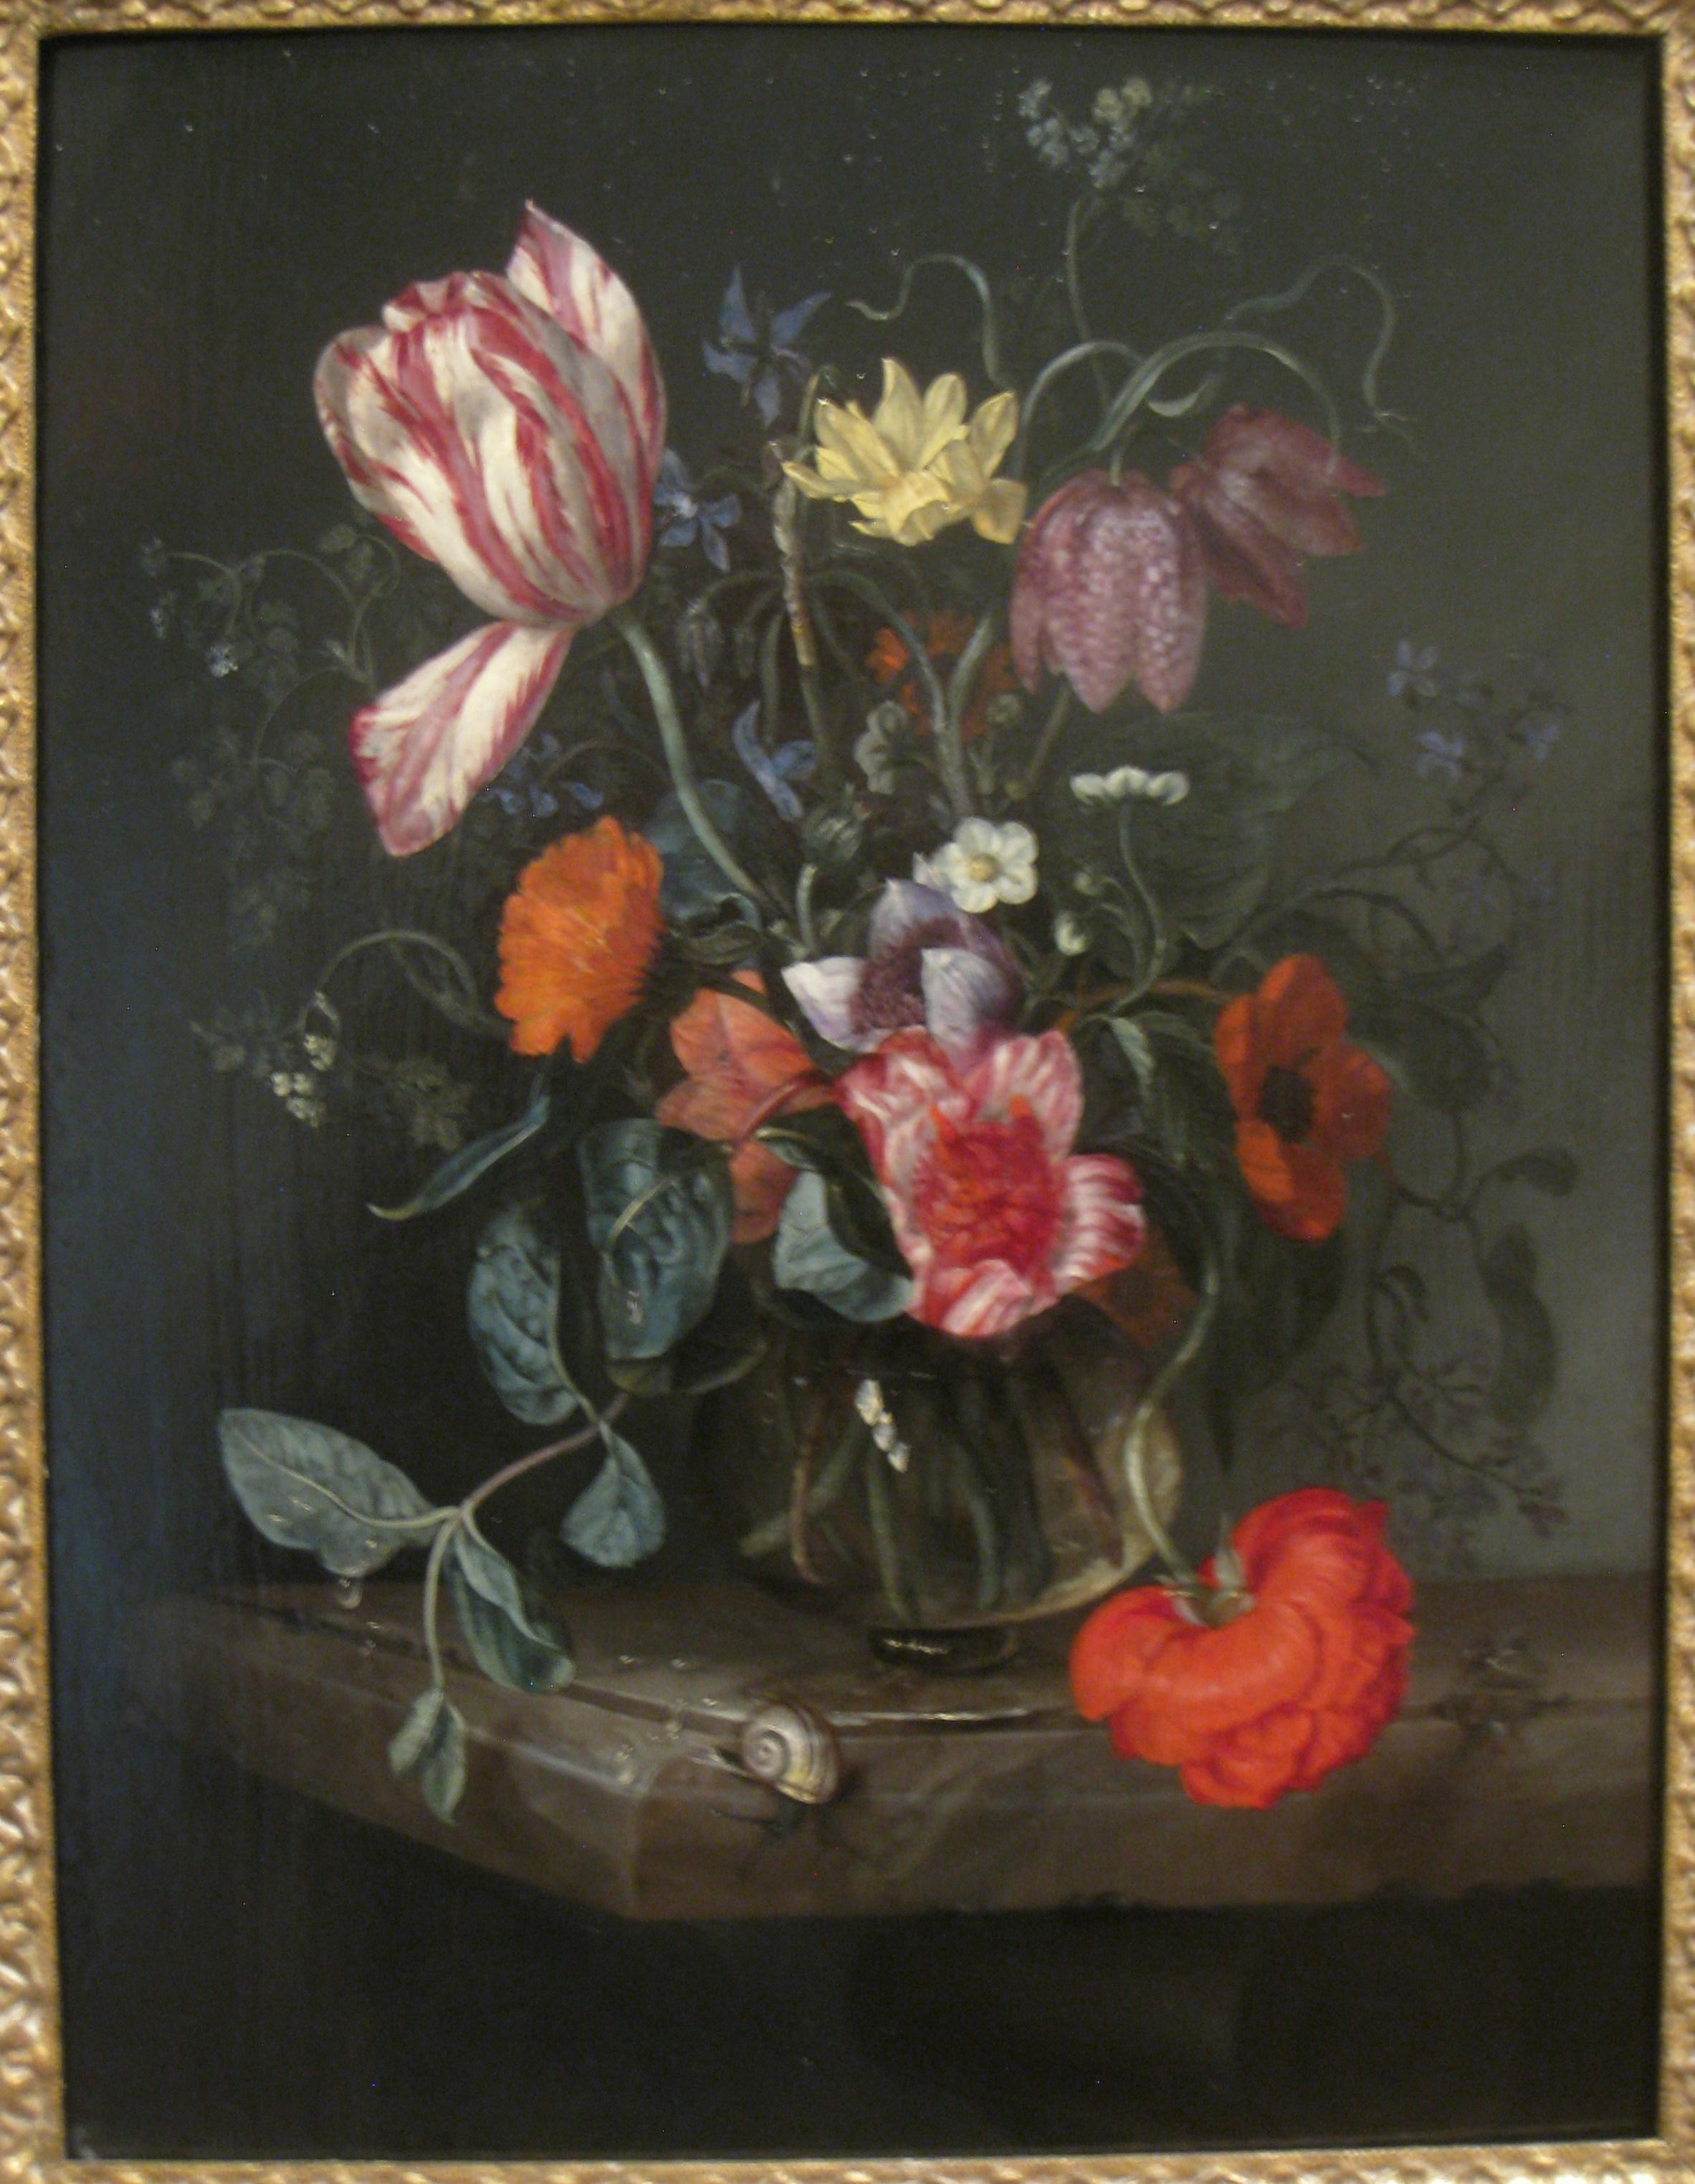 Phillip's Flowers Chicago Florist in Naperville